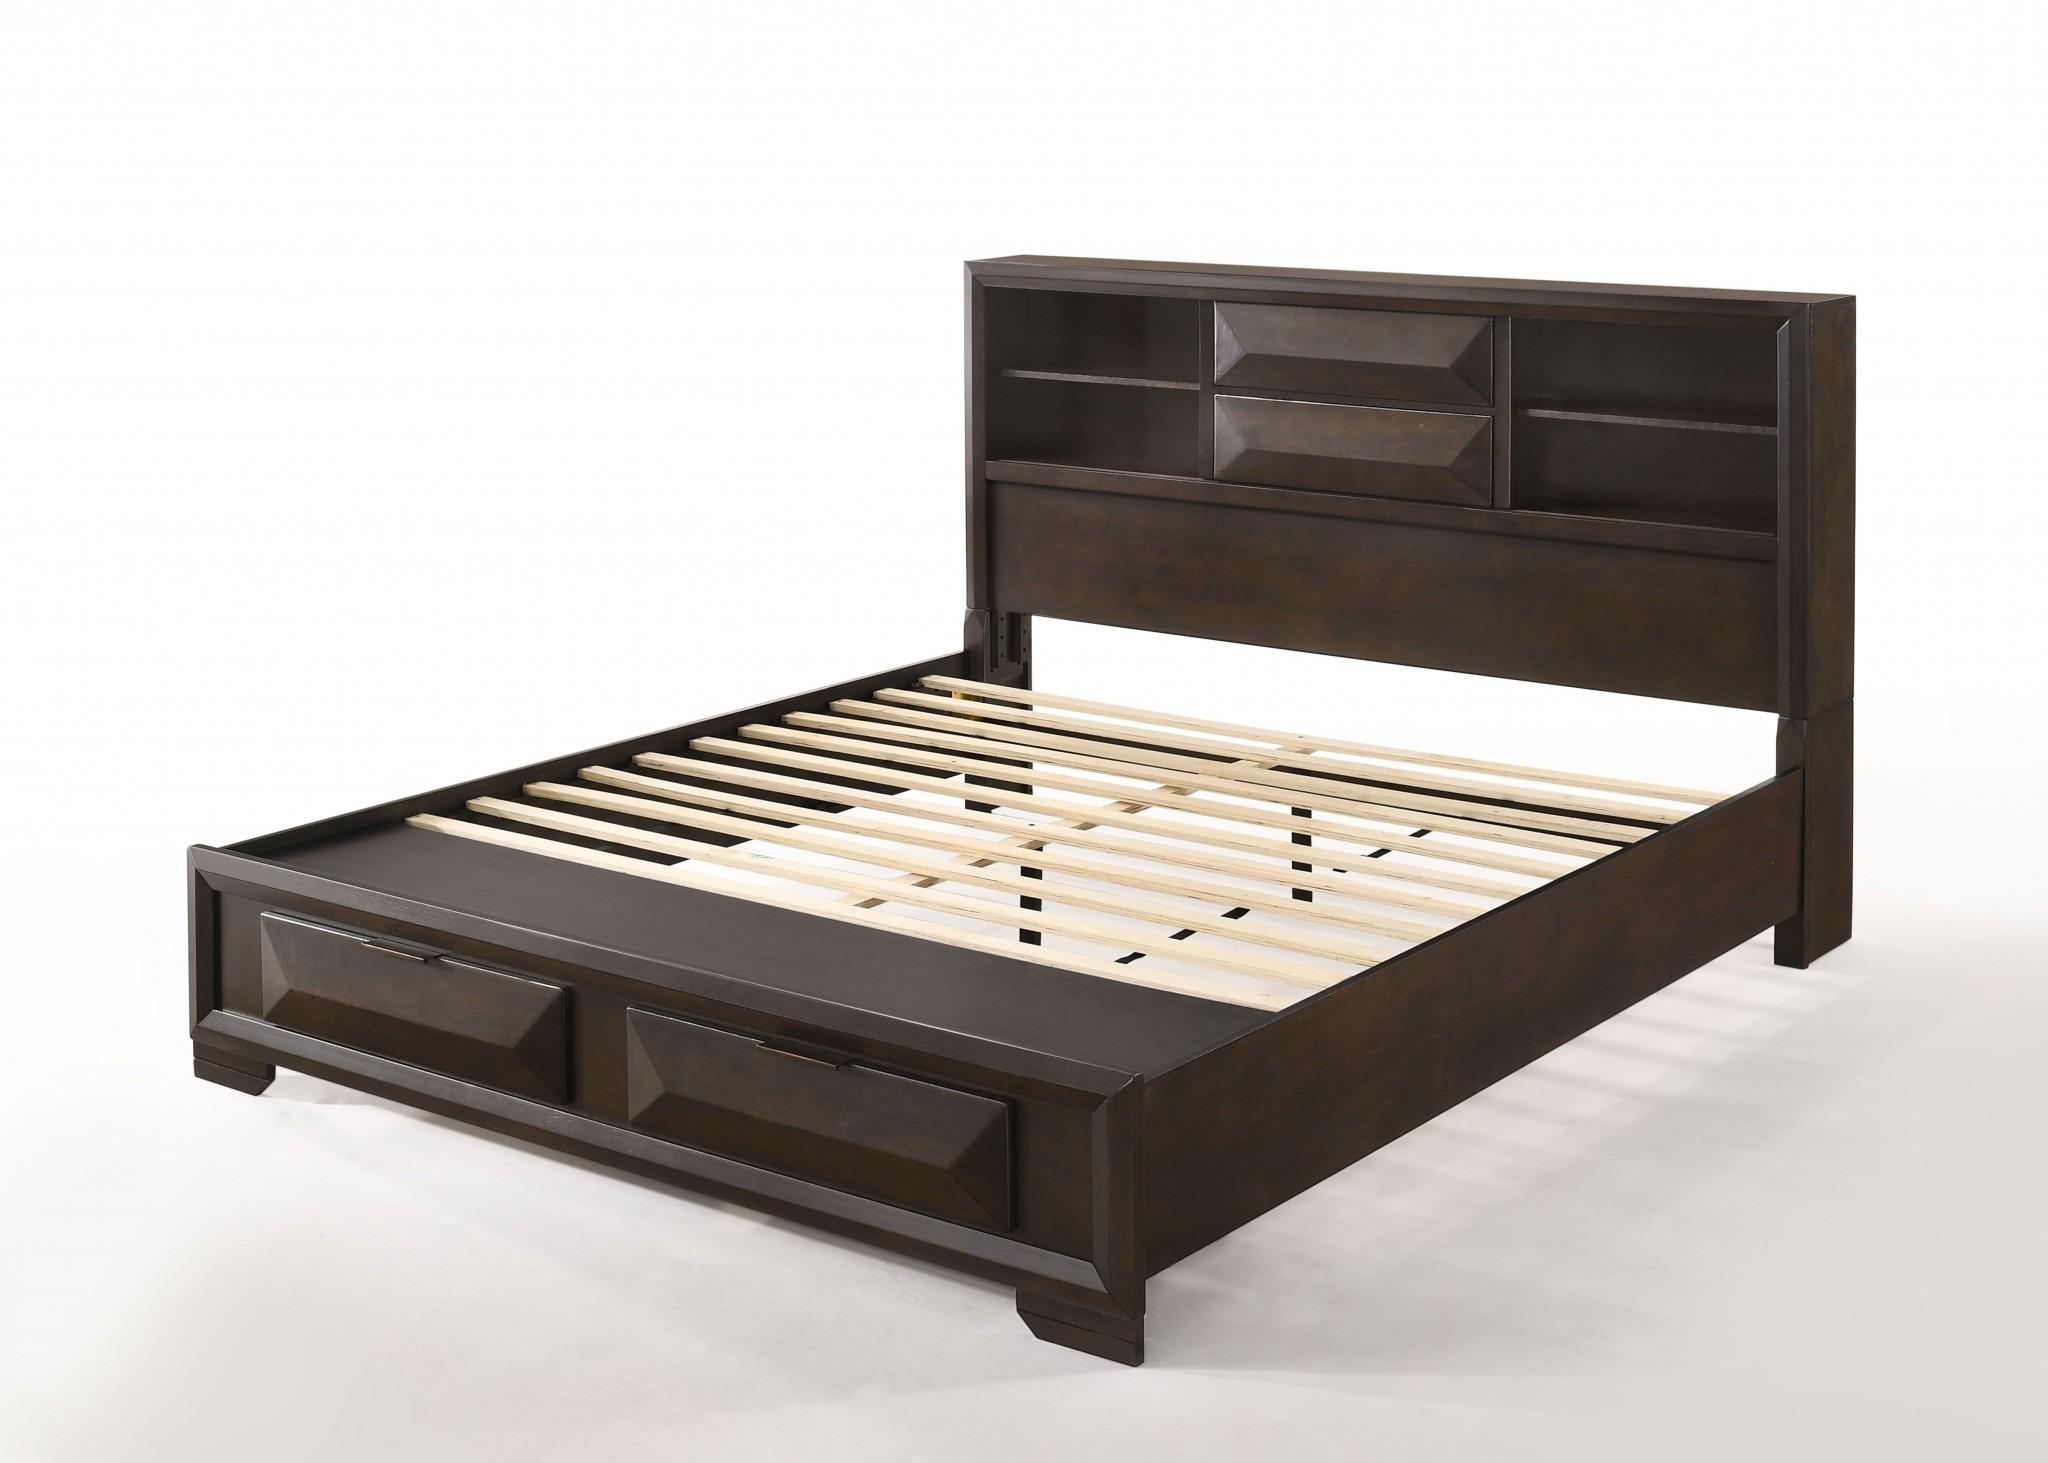 Eastern King Storage Bed In Espresso